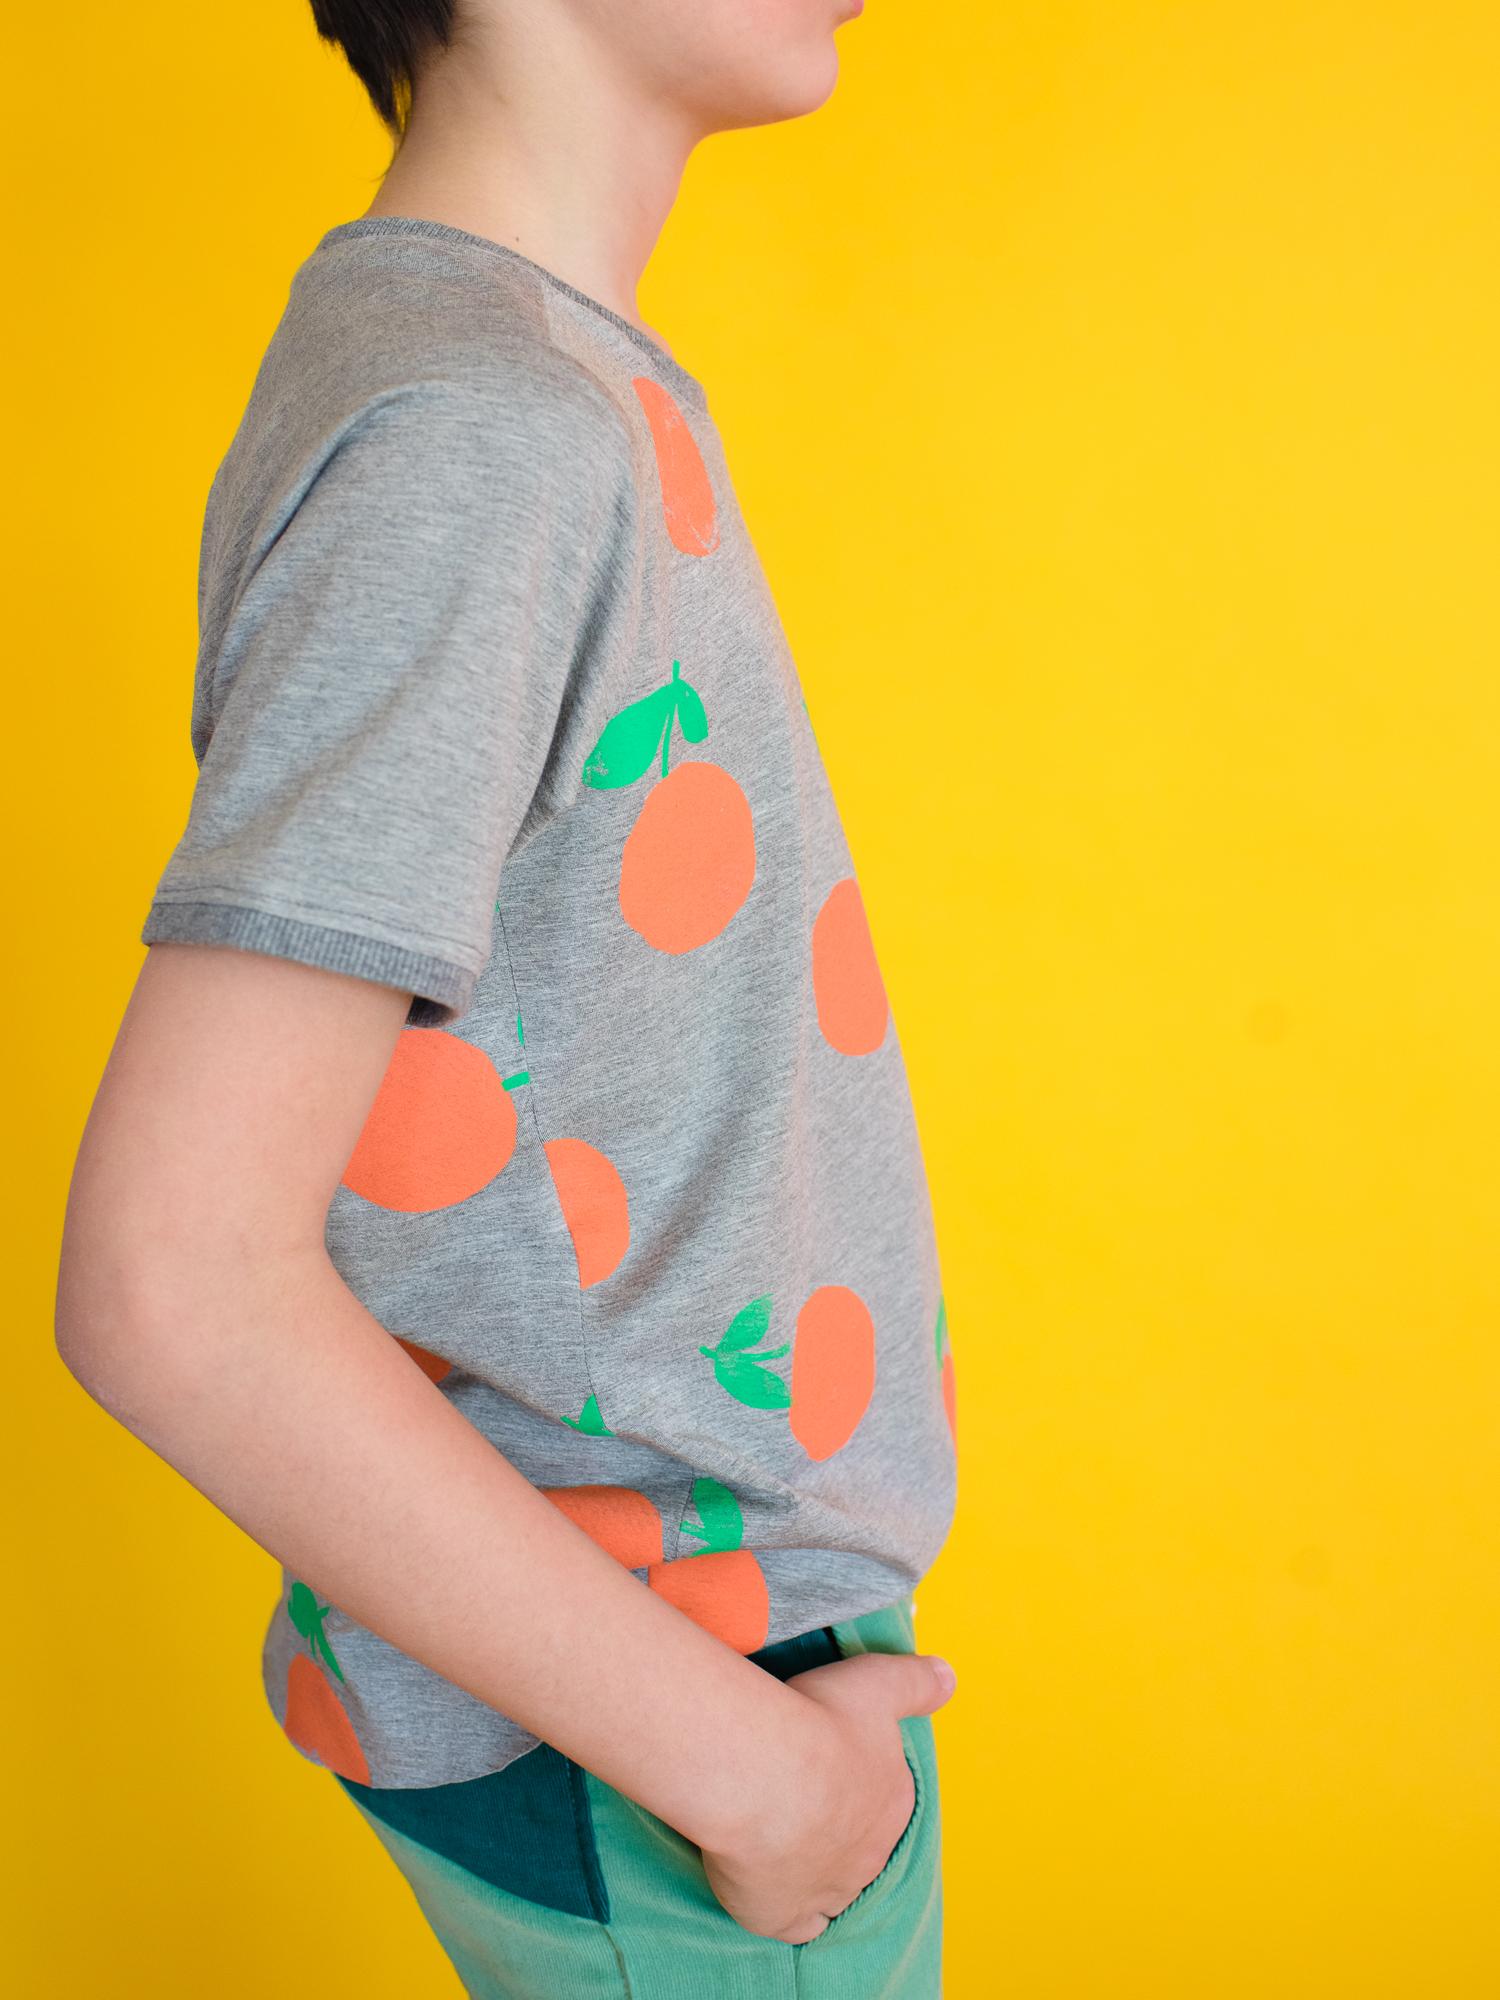 prp-kids-sewing-patterns36.jpg